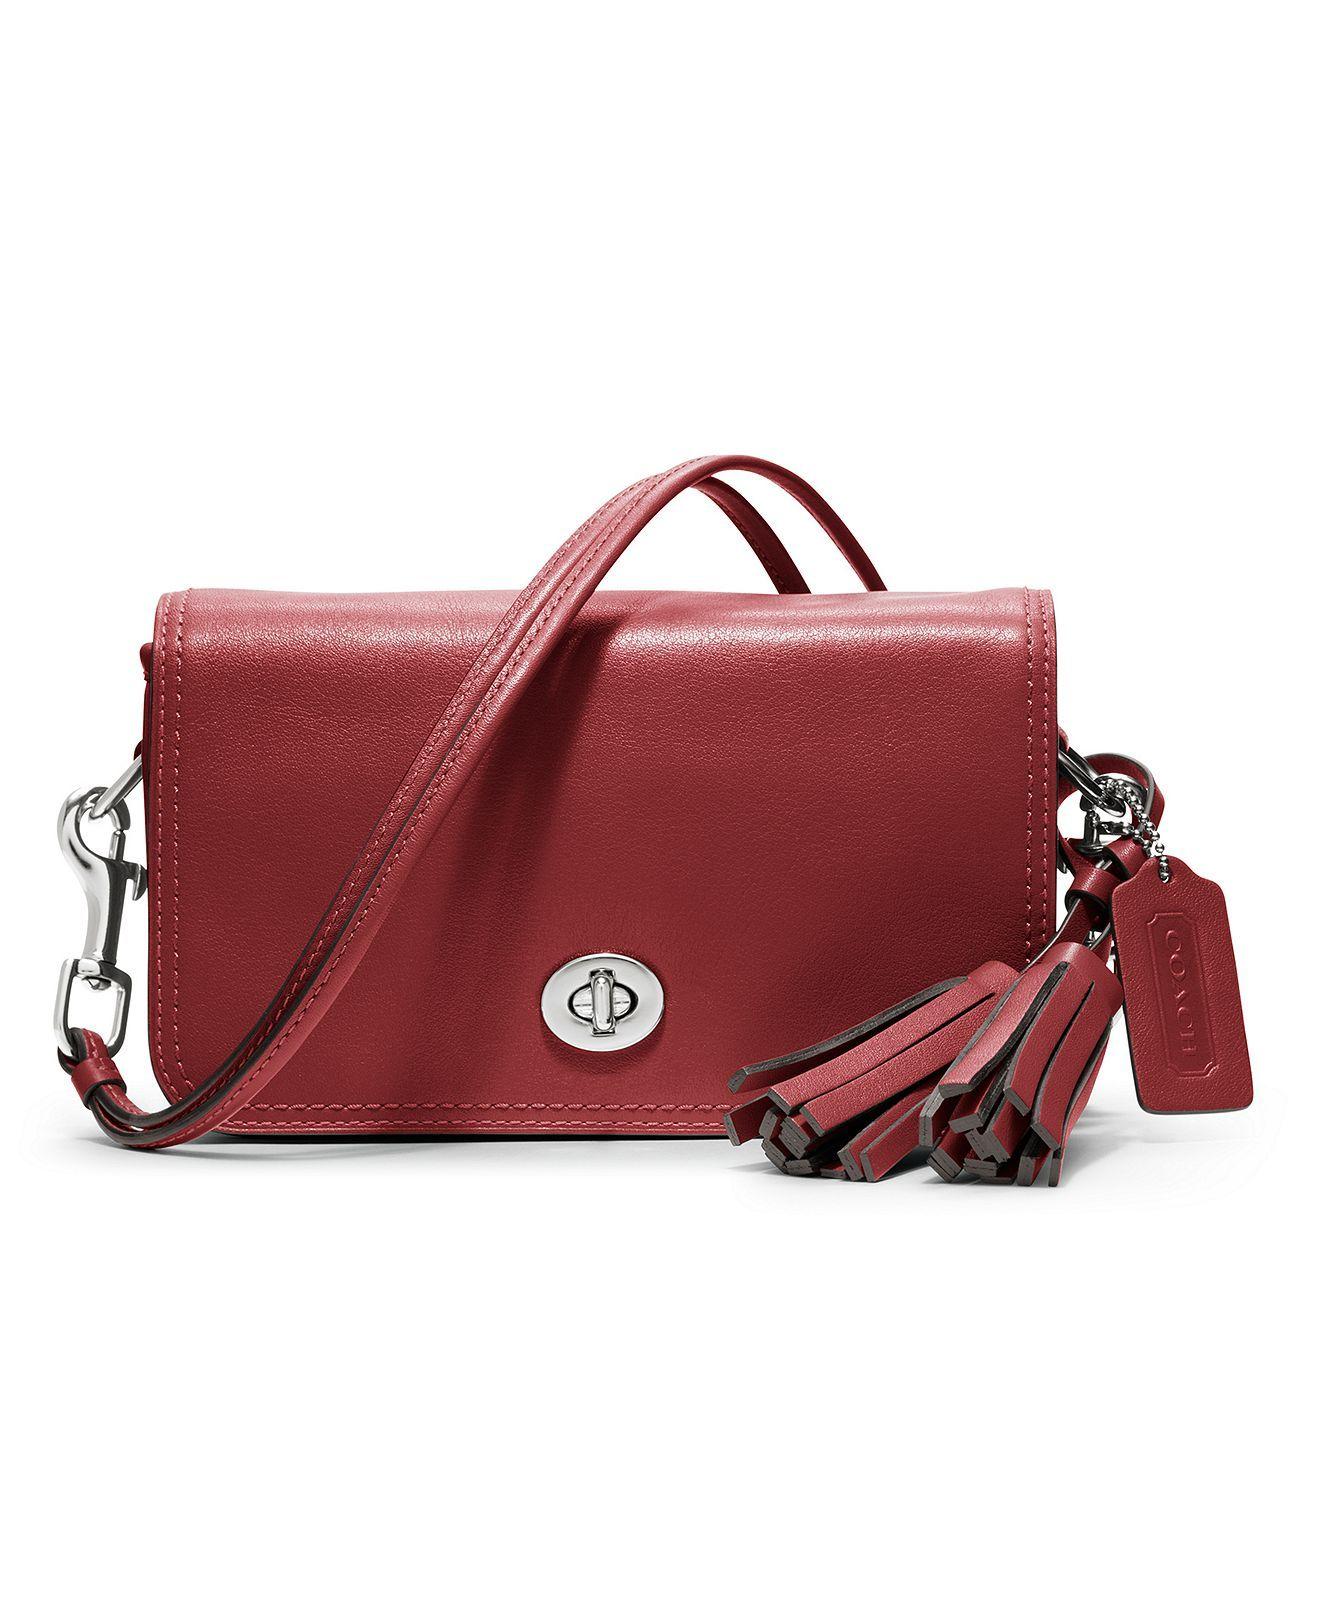 coach legacy leather penny shoulder purse macy s bags rh pinterest co uk